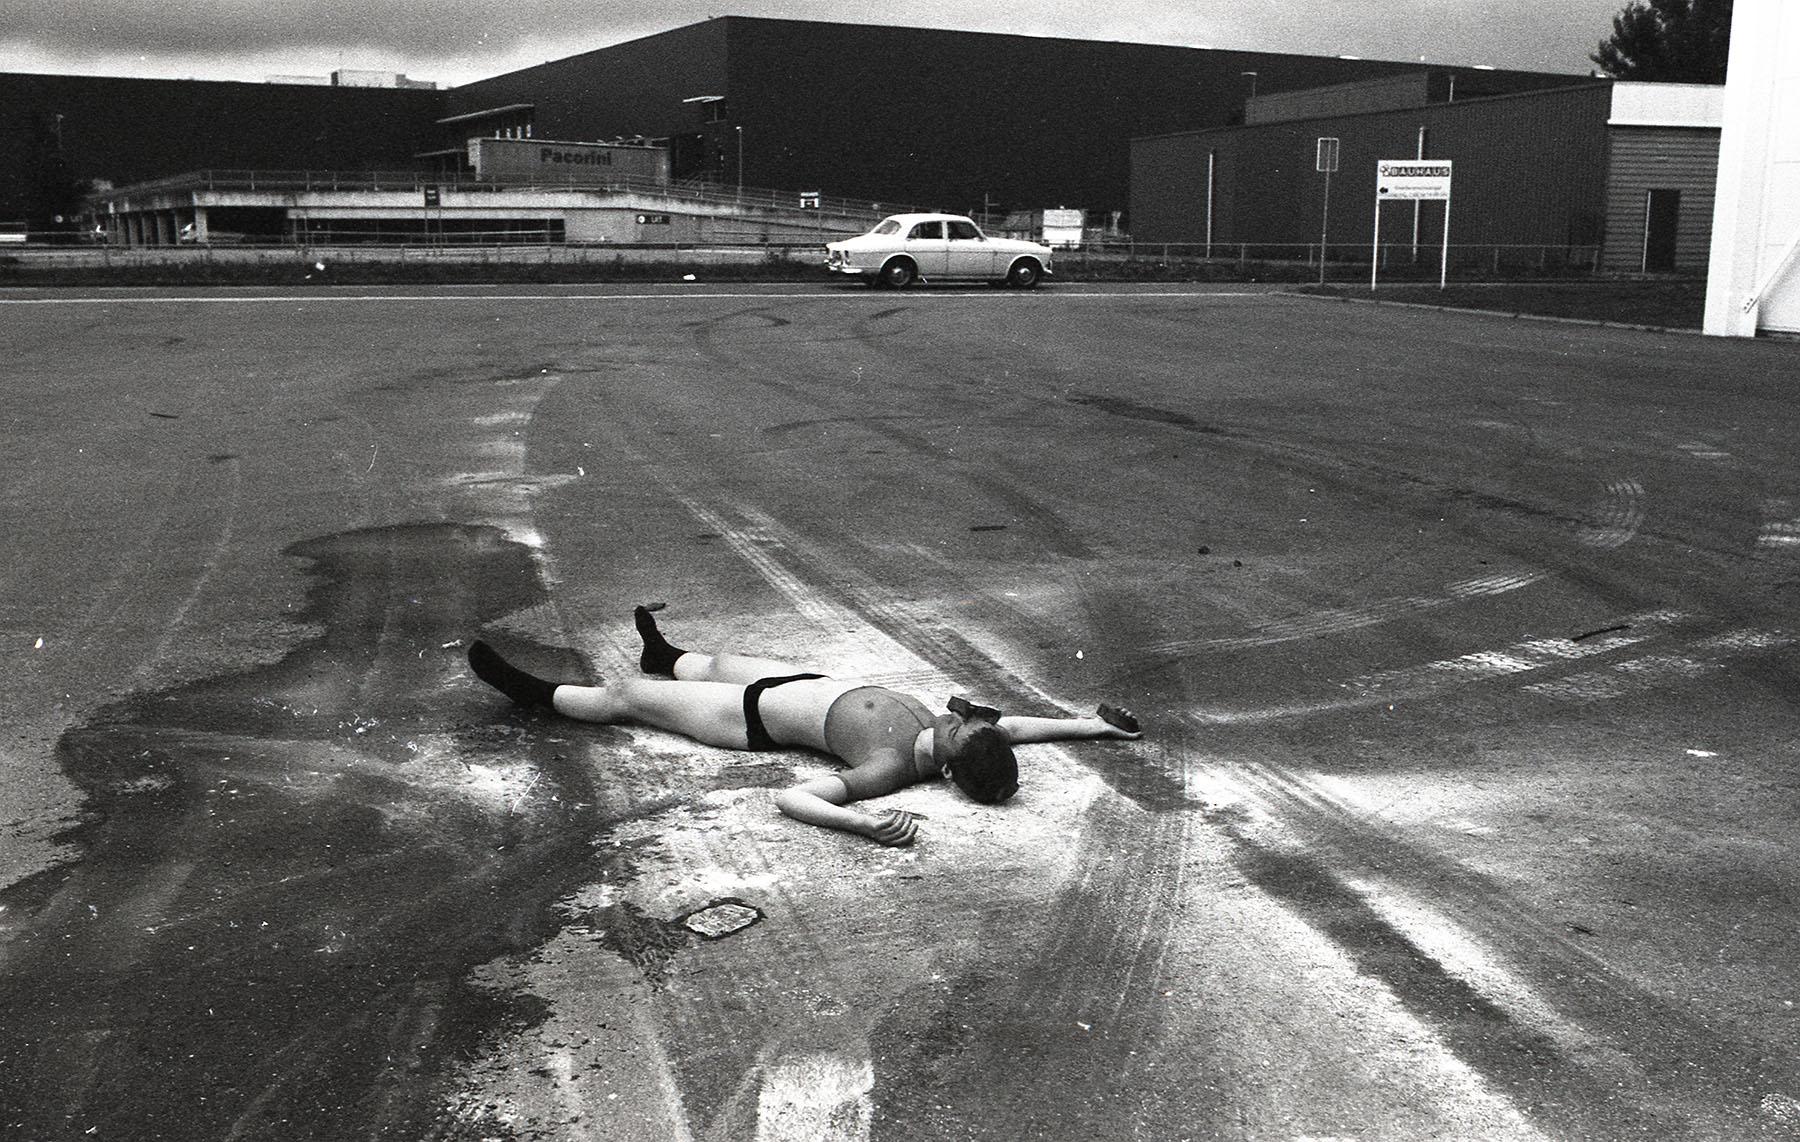 Diana Riden Over | Canon EOS 300 | Sigma 35mm  | Natalia Sliwowska